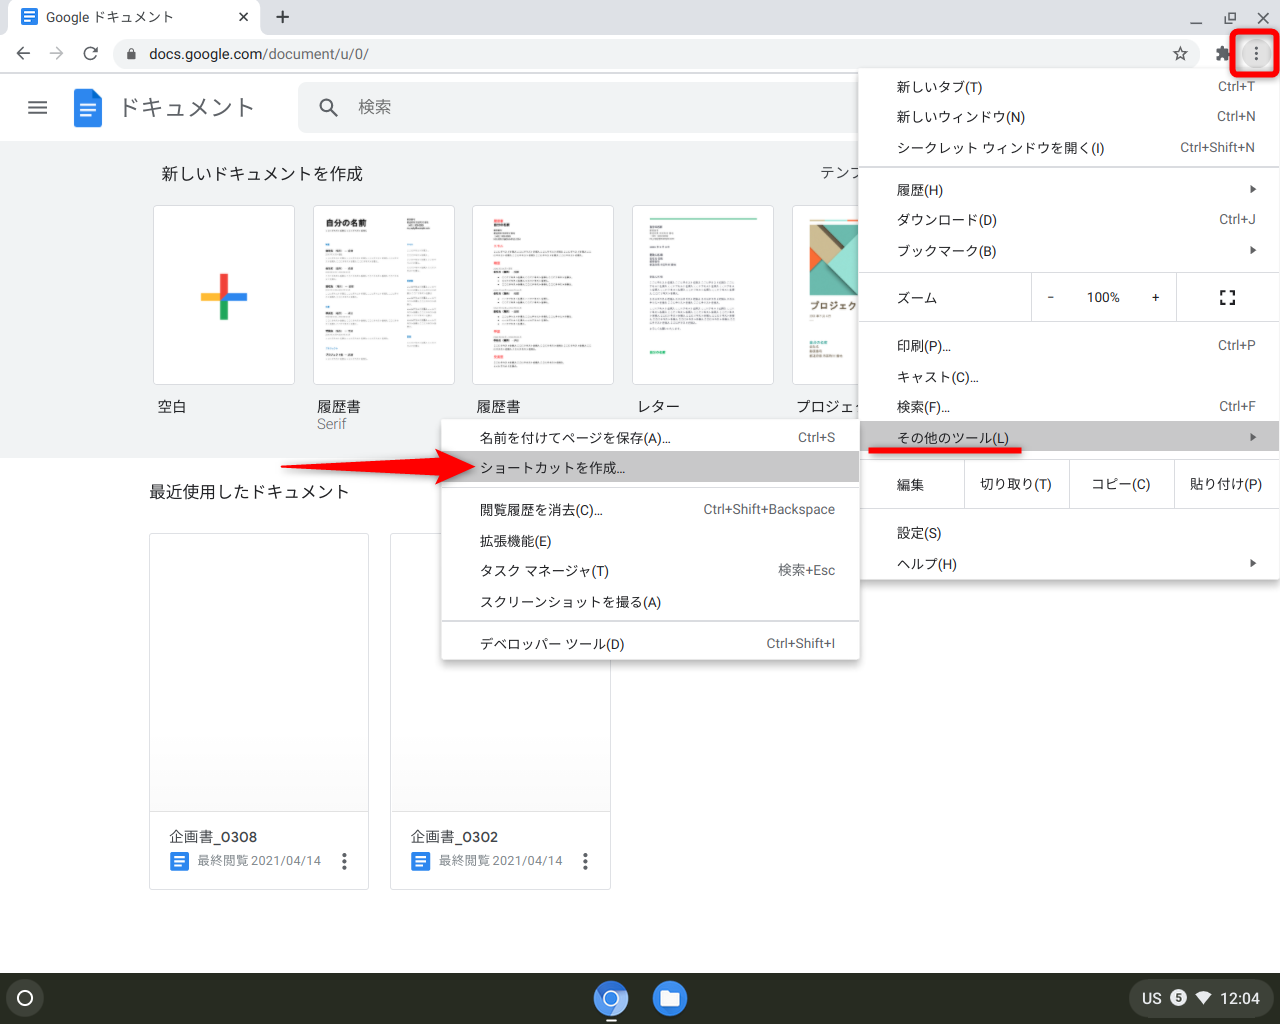 Chrome OSにアプリをインストールする